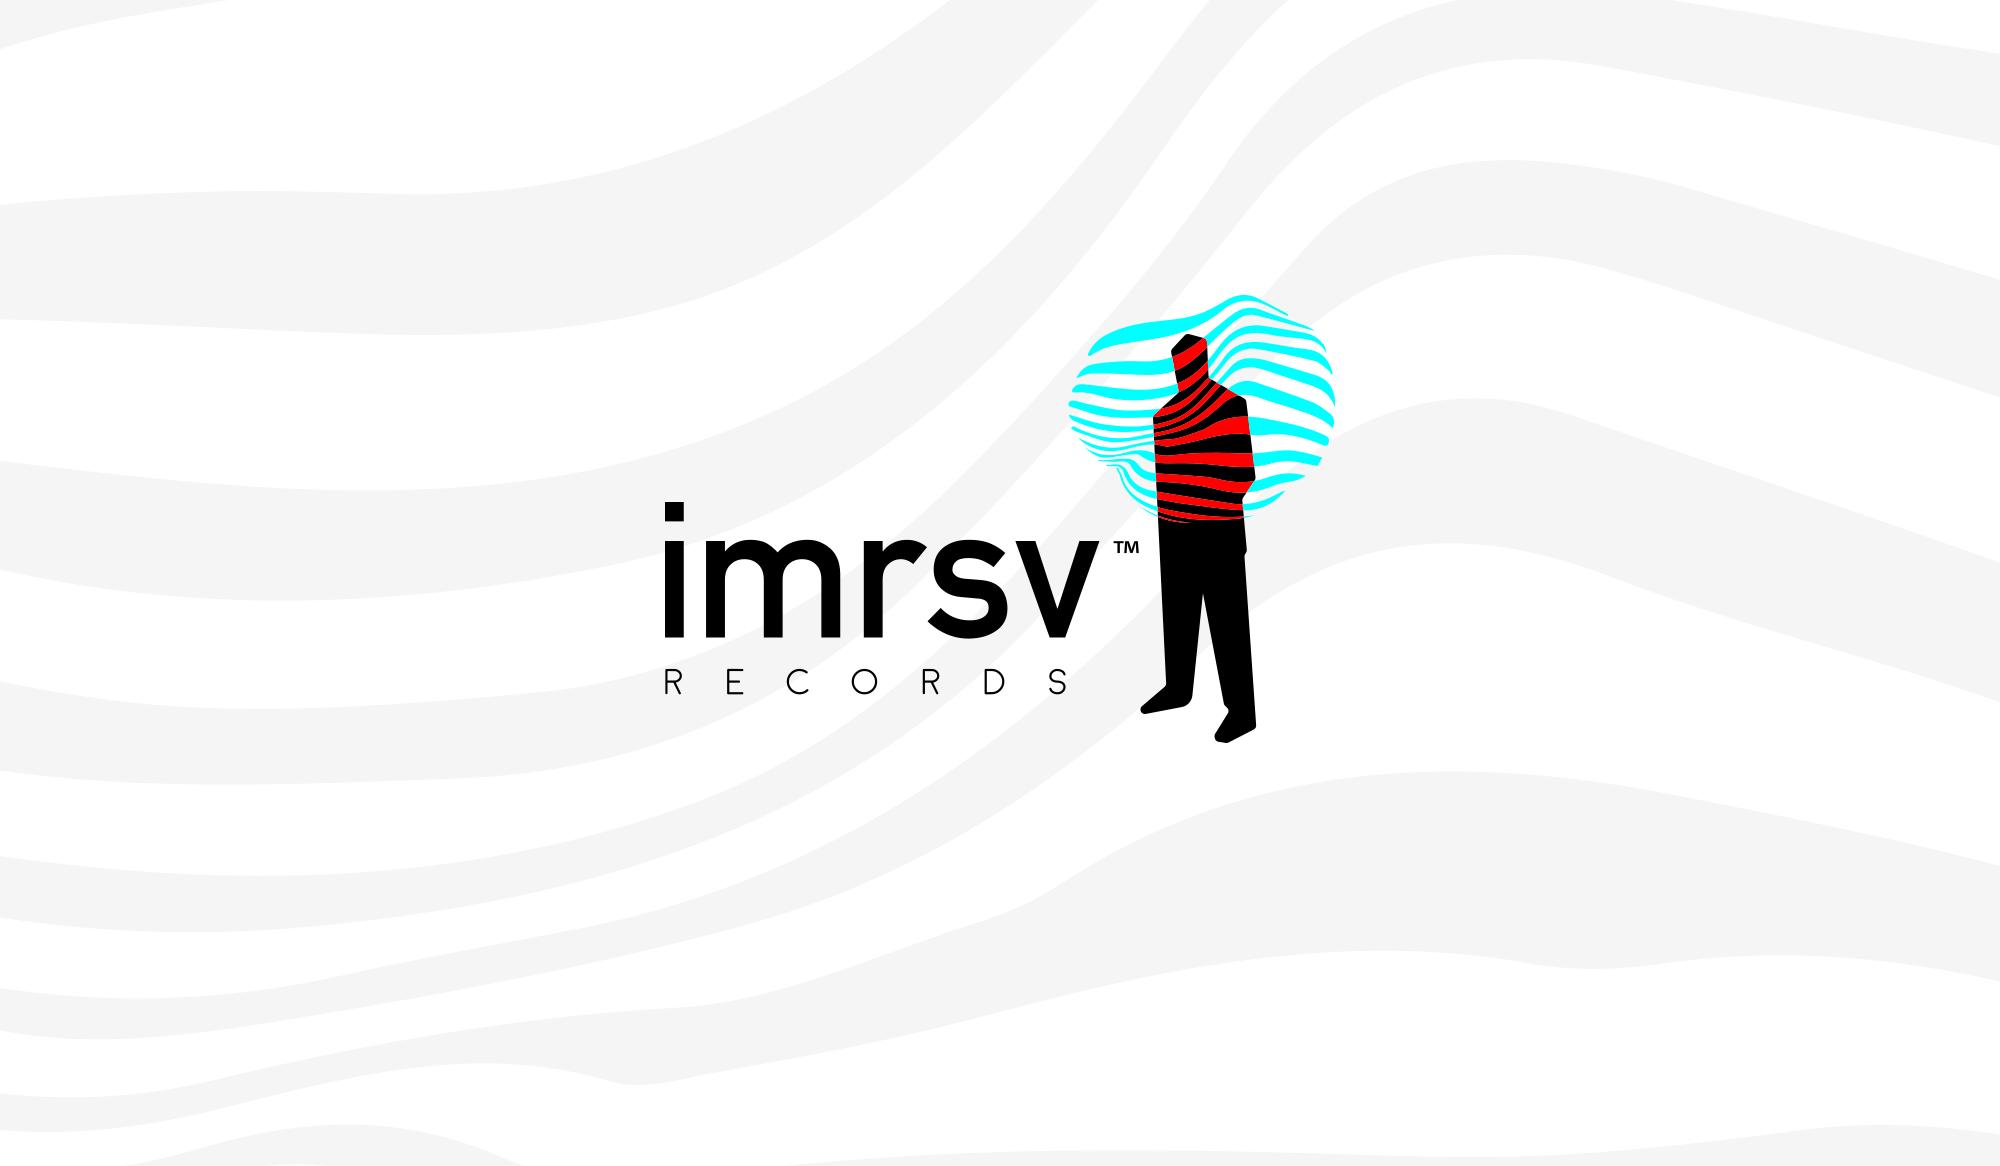 quentin_paquignon-branding-visual_identity-imrsv-records™_01.png